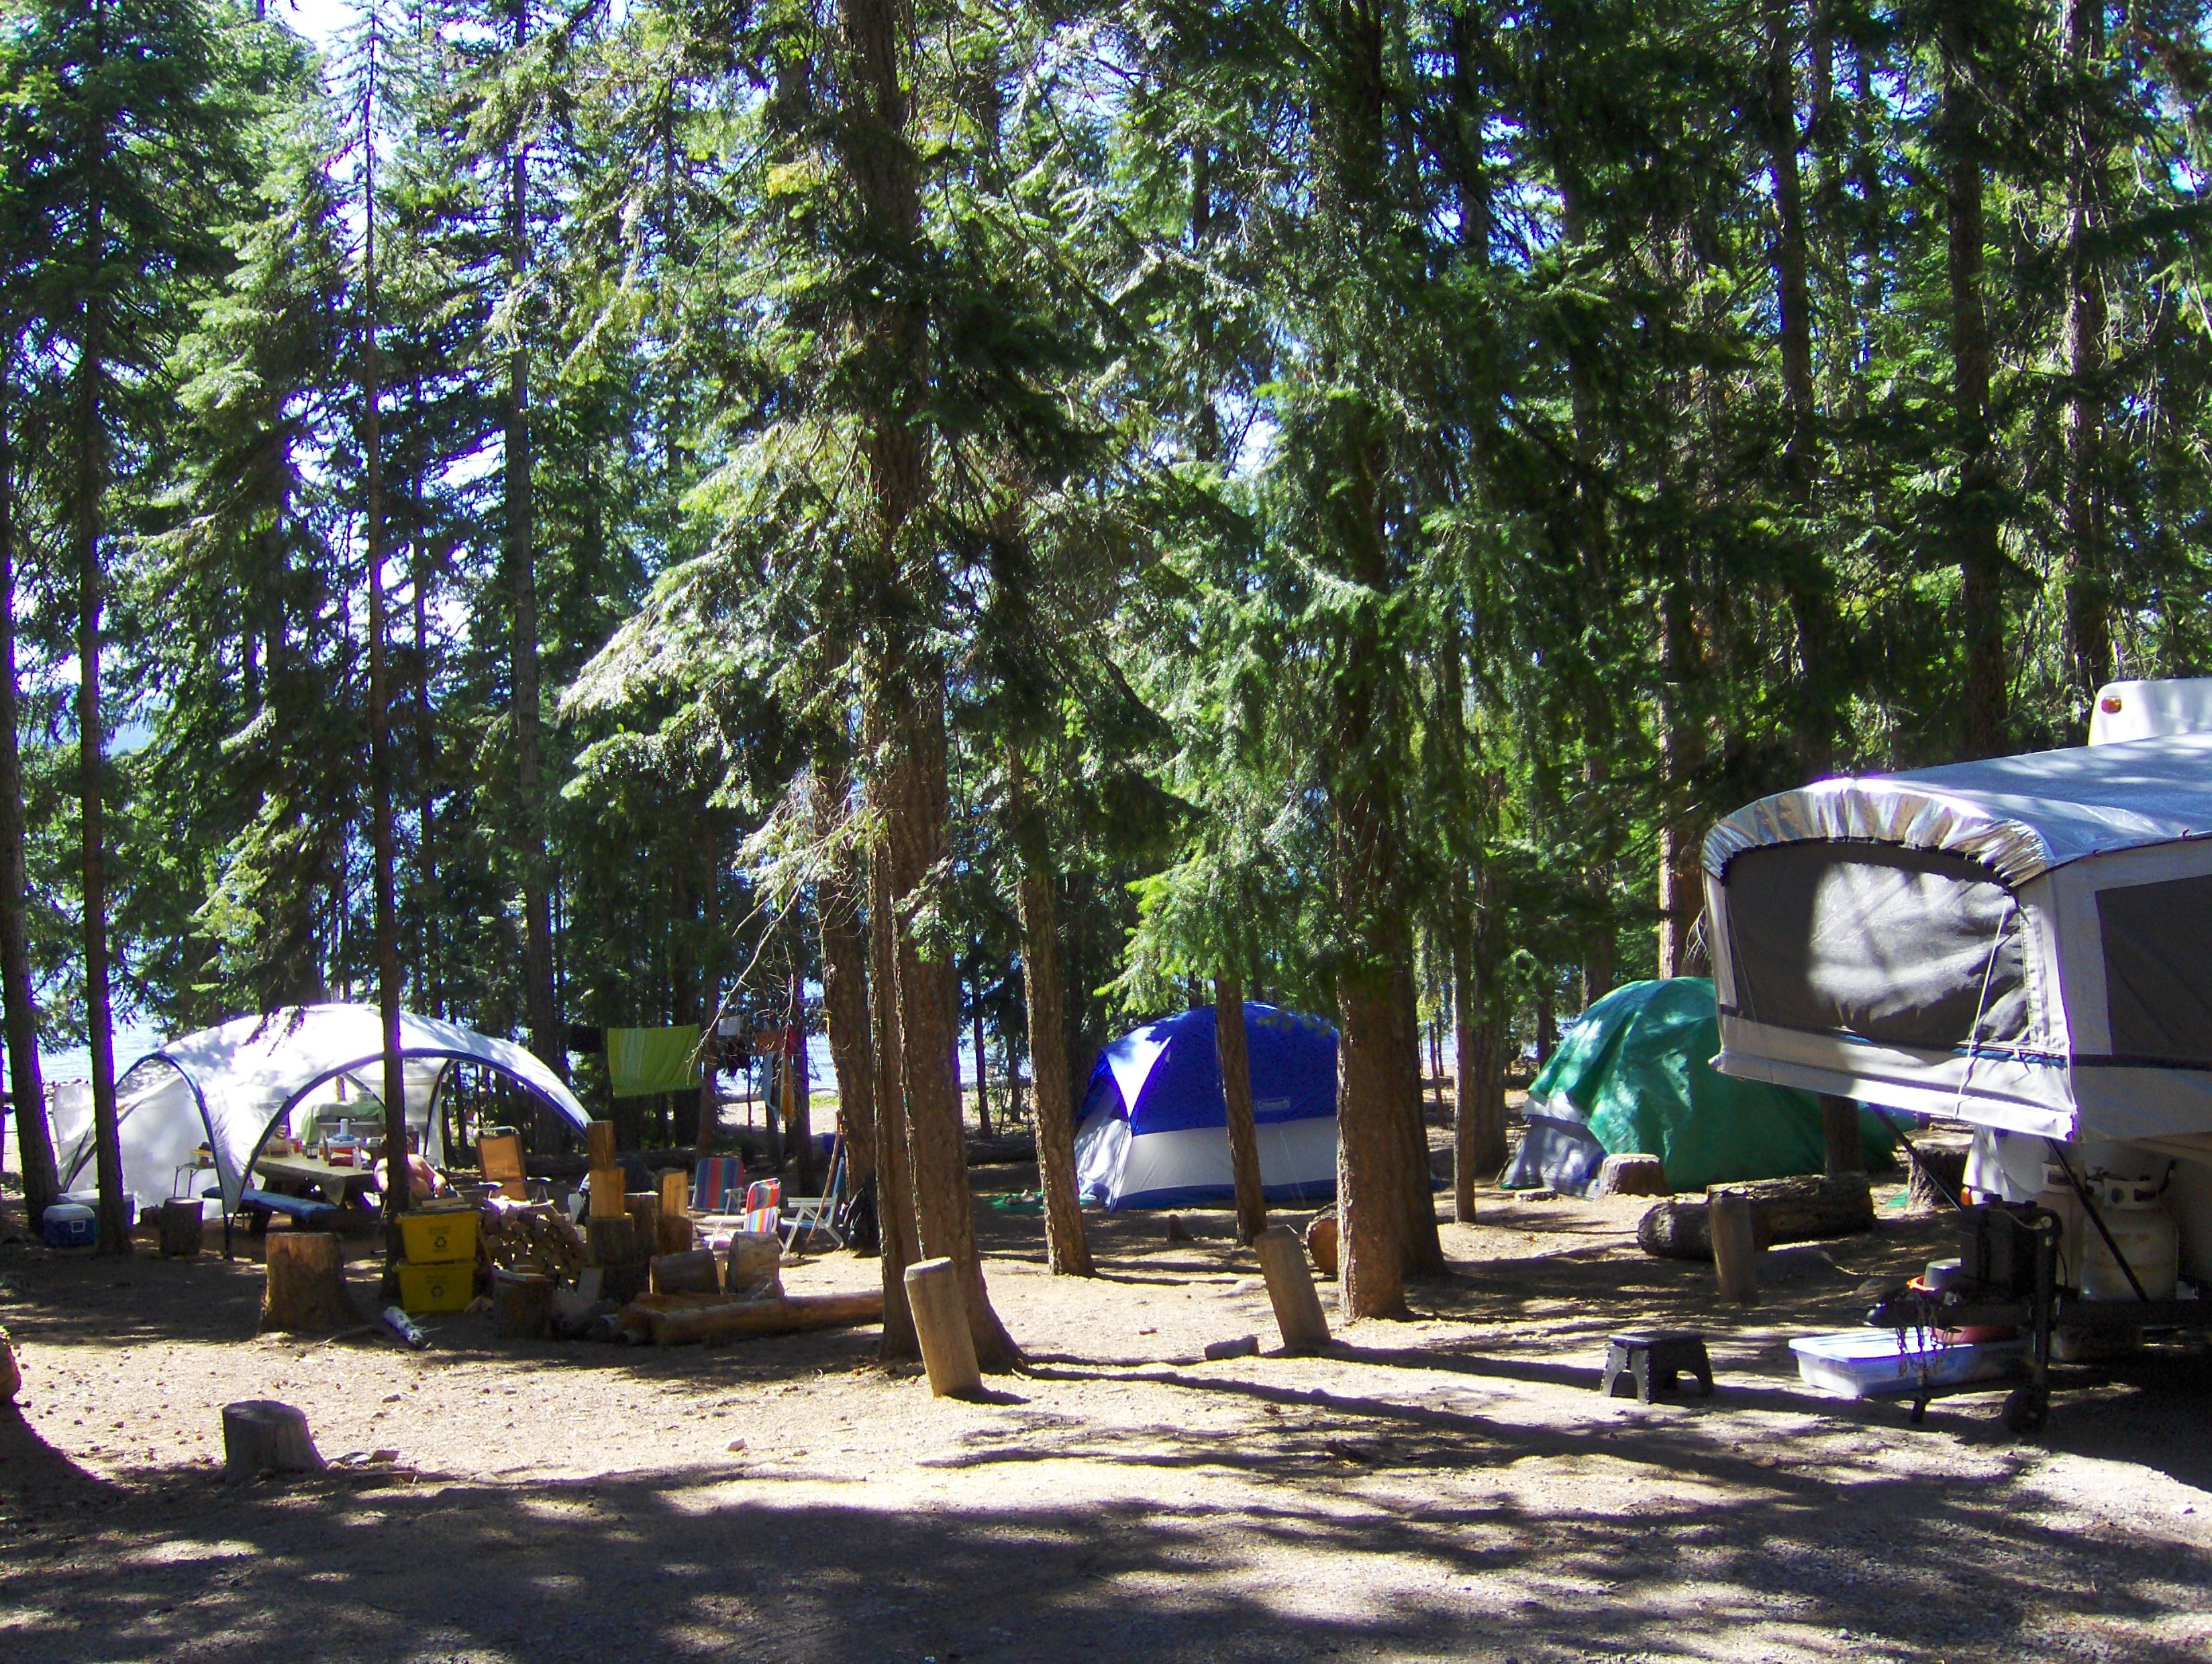 Camping at Cultus Lake, Oregon   Central oregon, Oregon, Lake